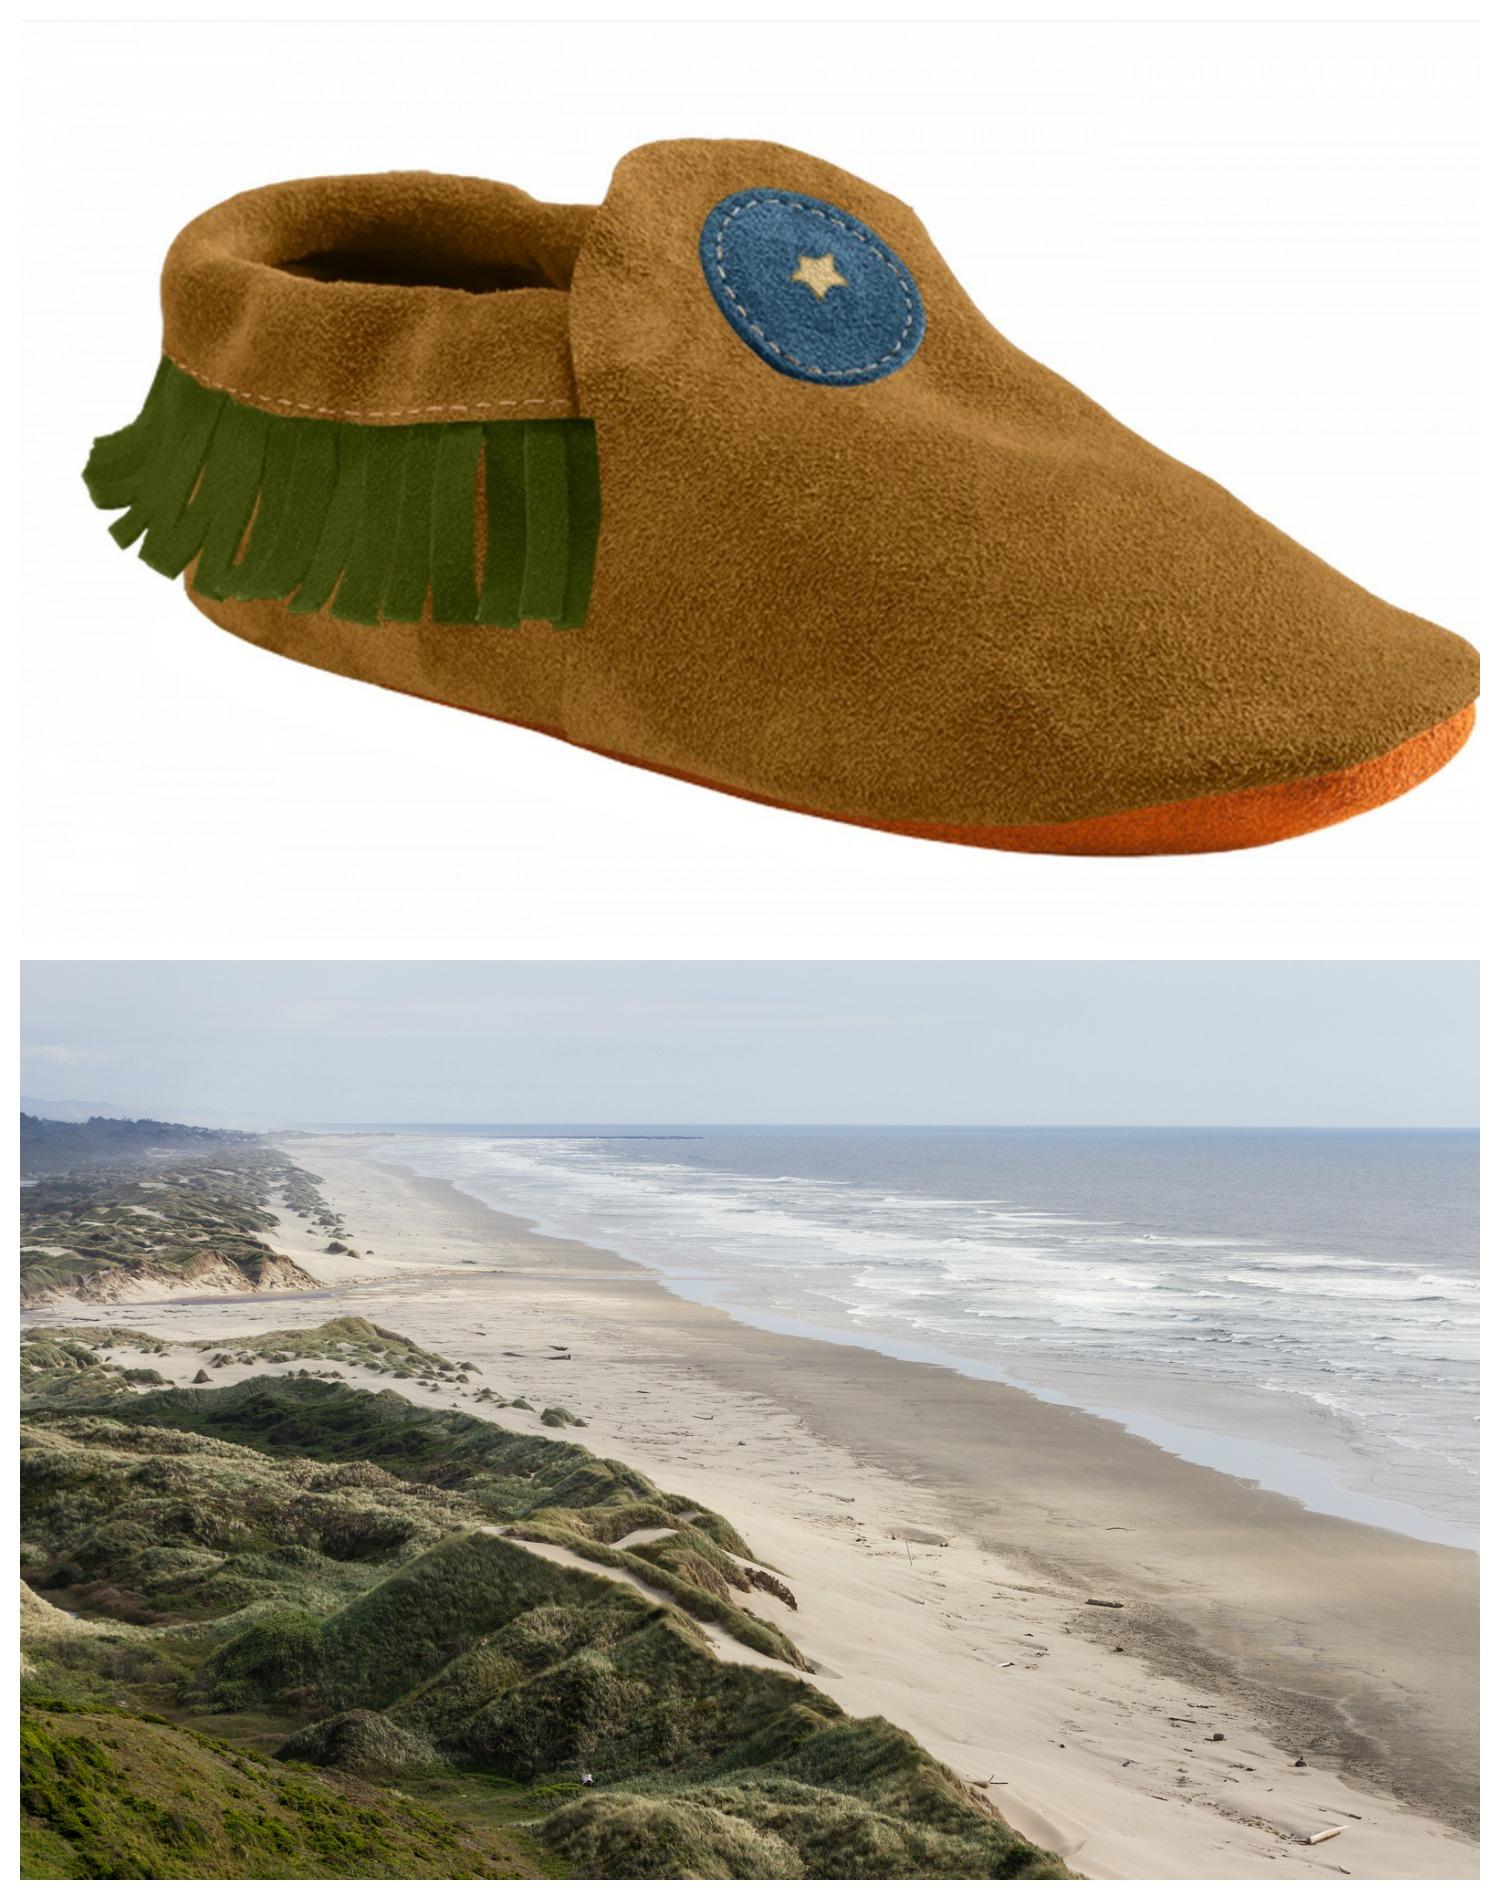 Oregon Dunes-Inspired Moccasin